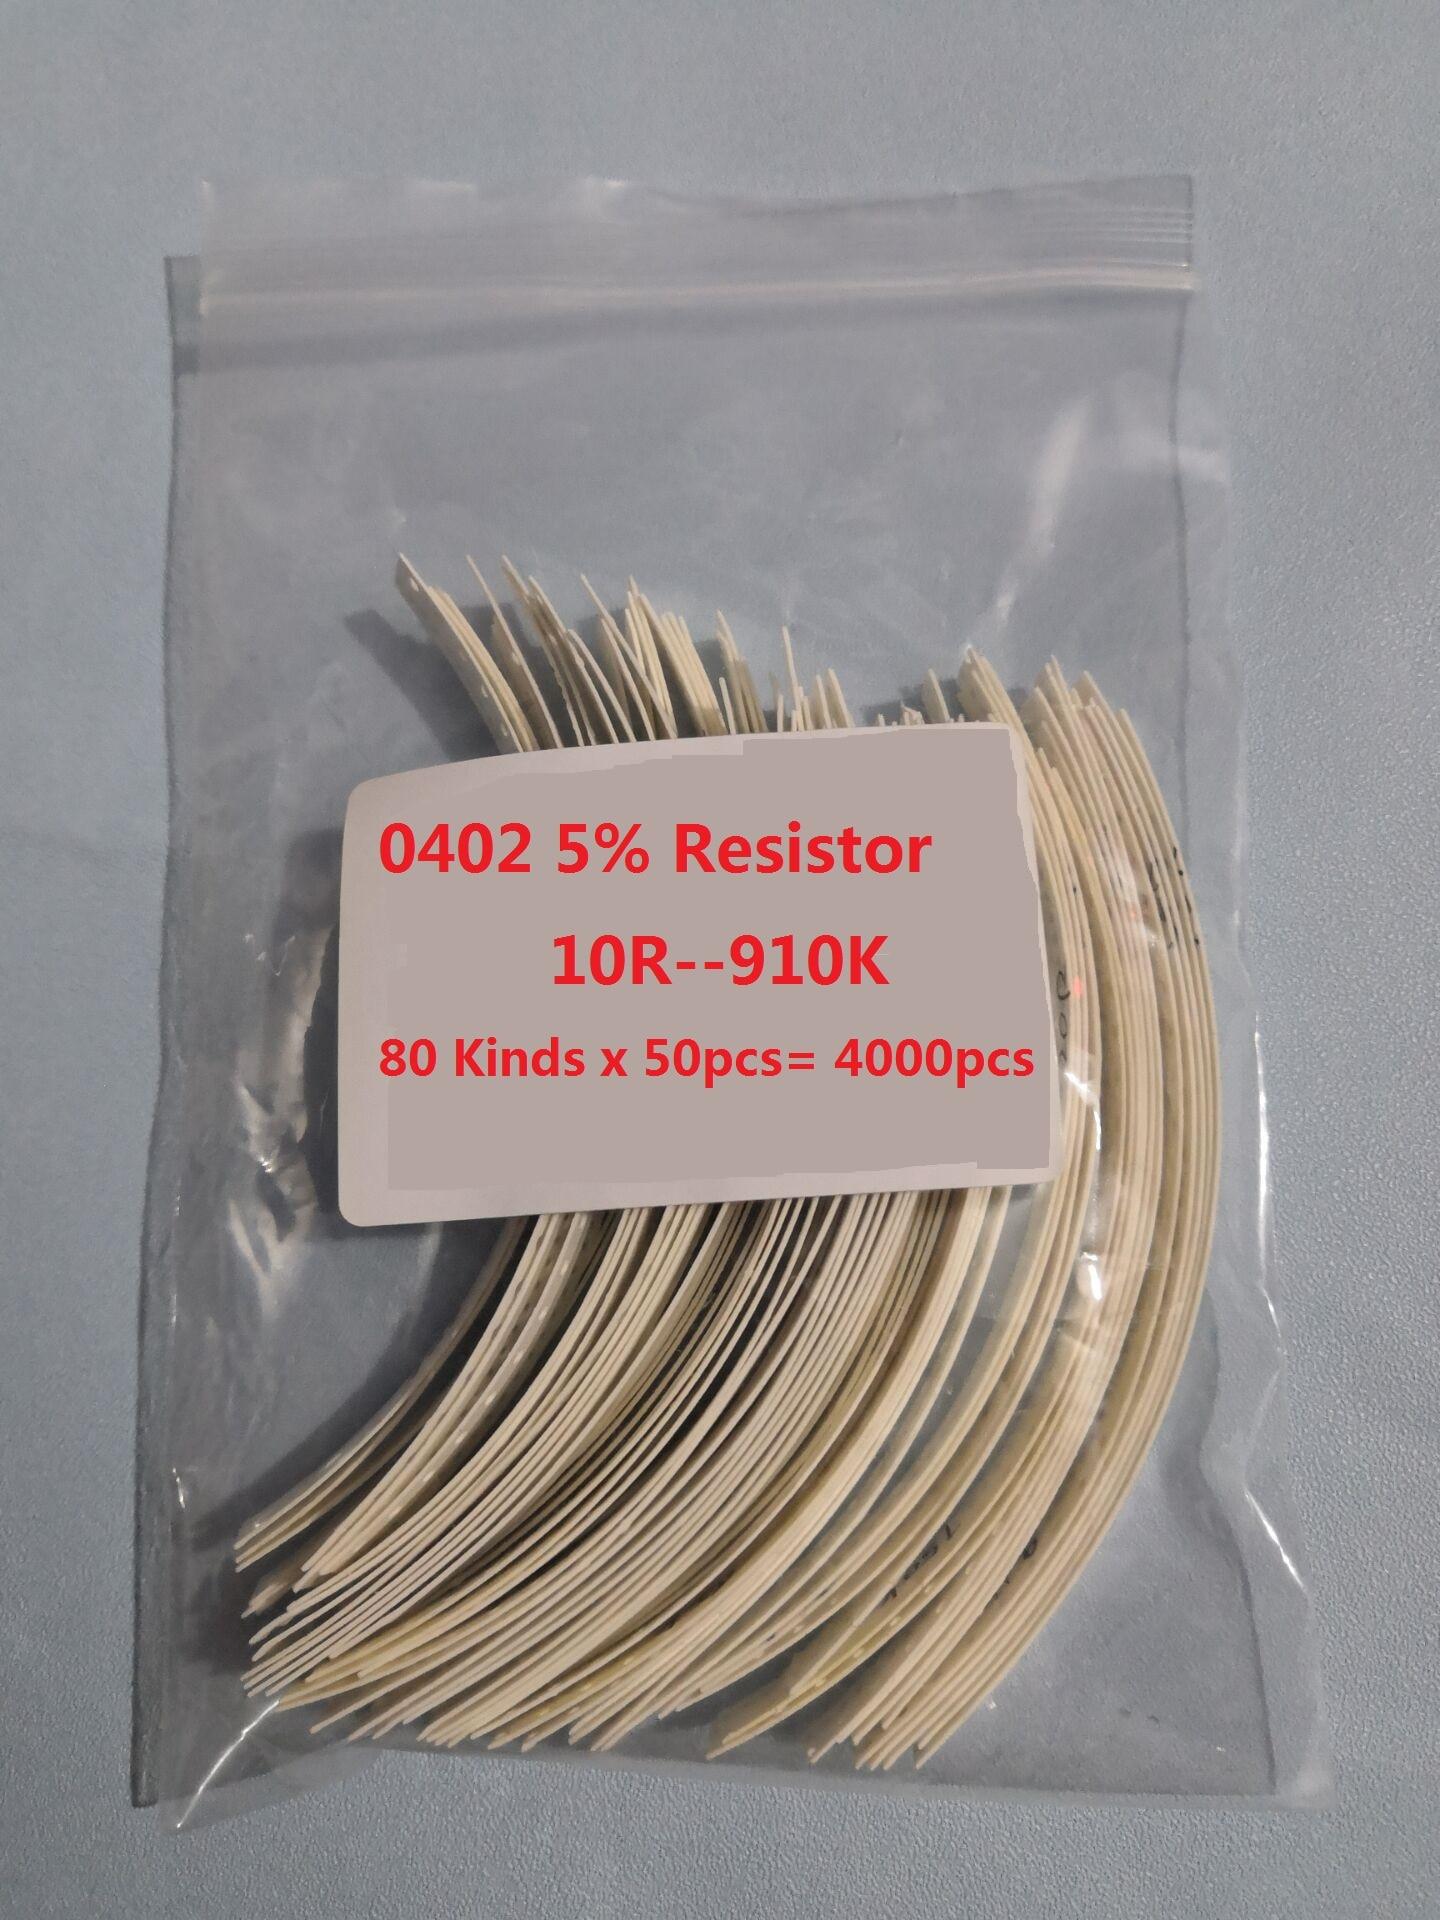 0402 smd resistor kit 80 tipos x 50 pces = 4000 pces 10r a 1m 5% amostra sortidas kit 910k 470k 100k 10k 4.7k 1k 470r 220r 100r ohm